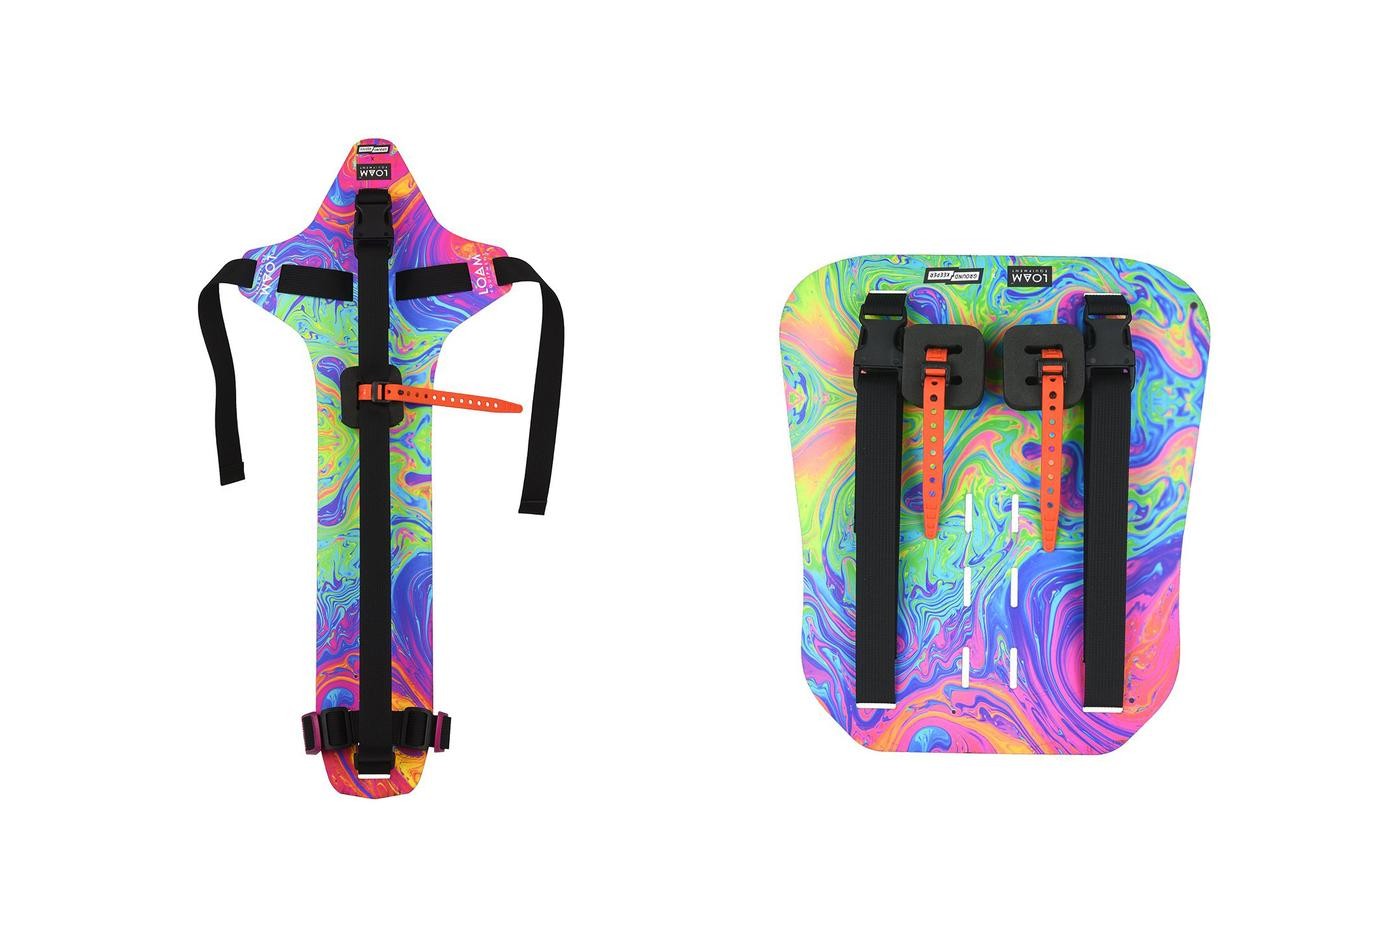 Ground Keeper and Loam Equipment Bikepacking Harnesses